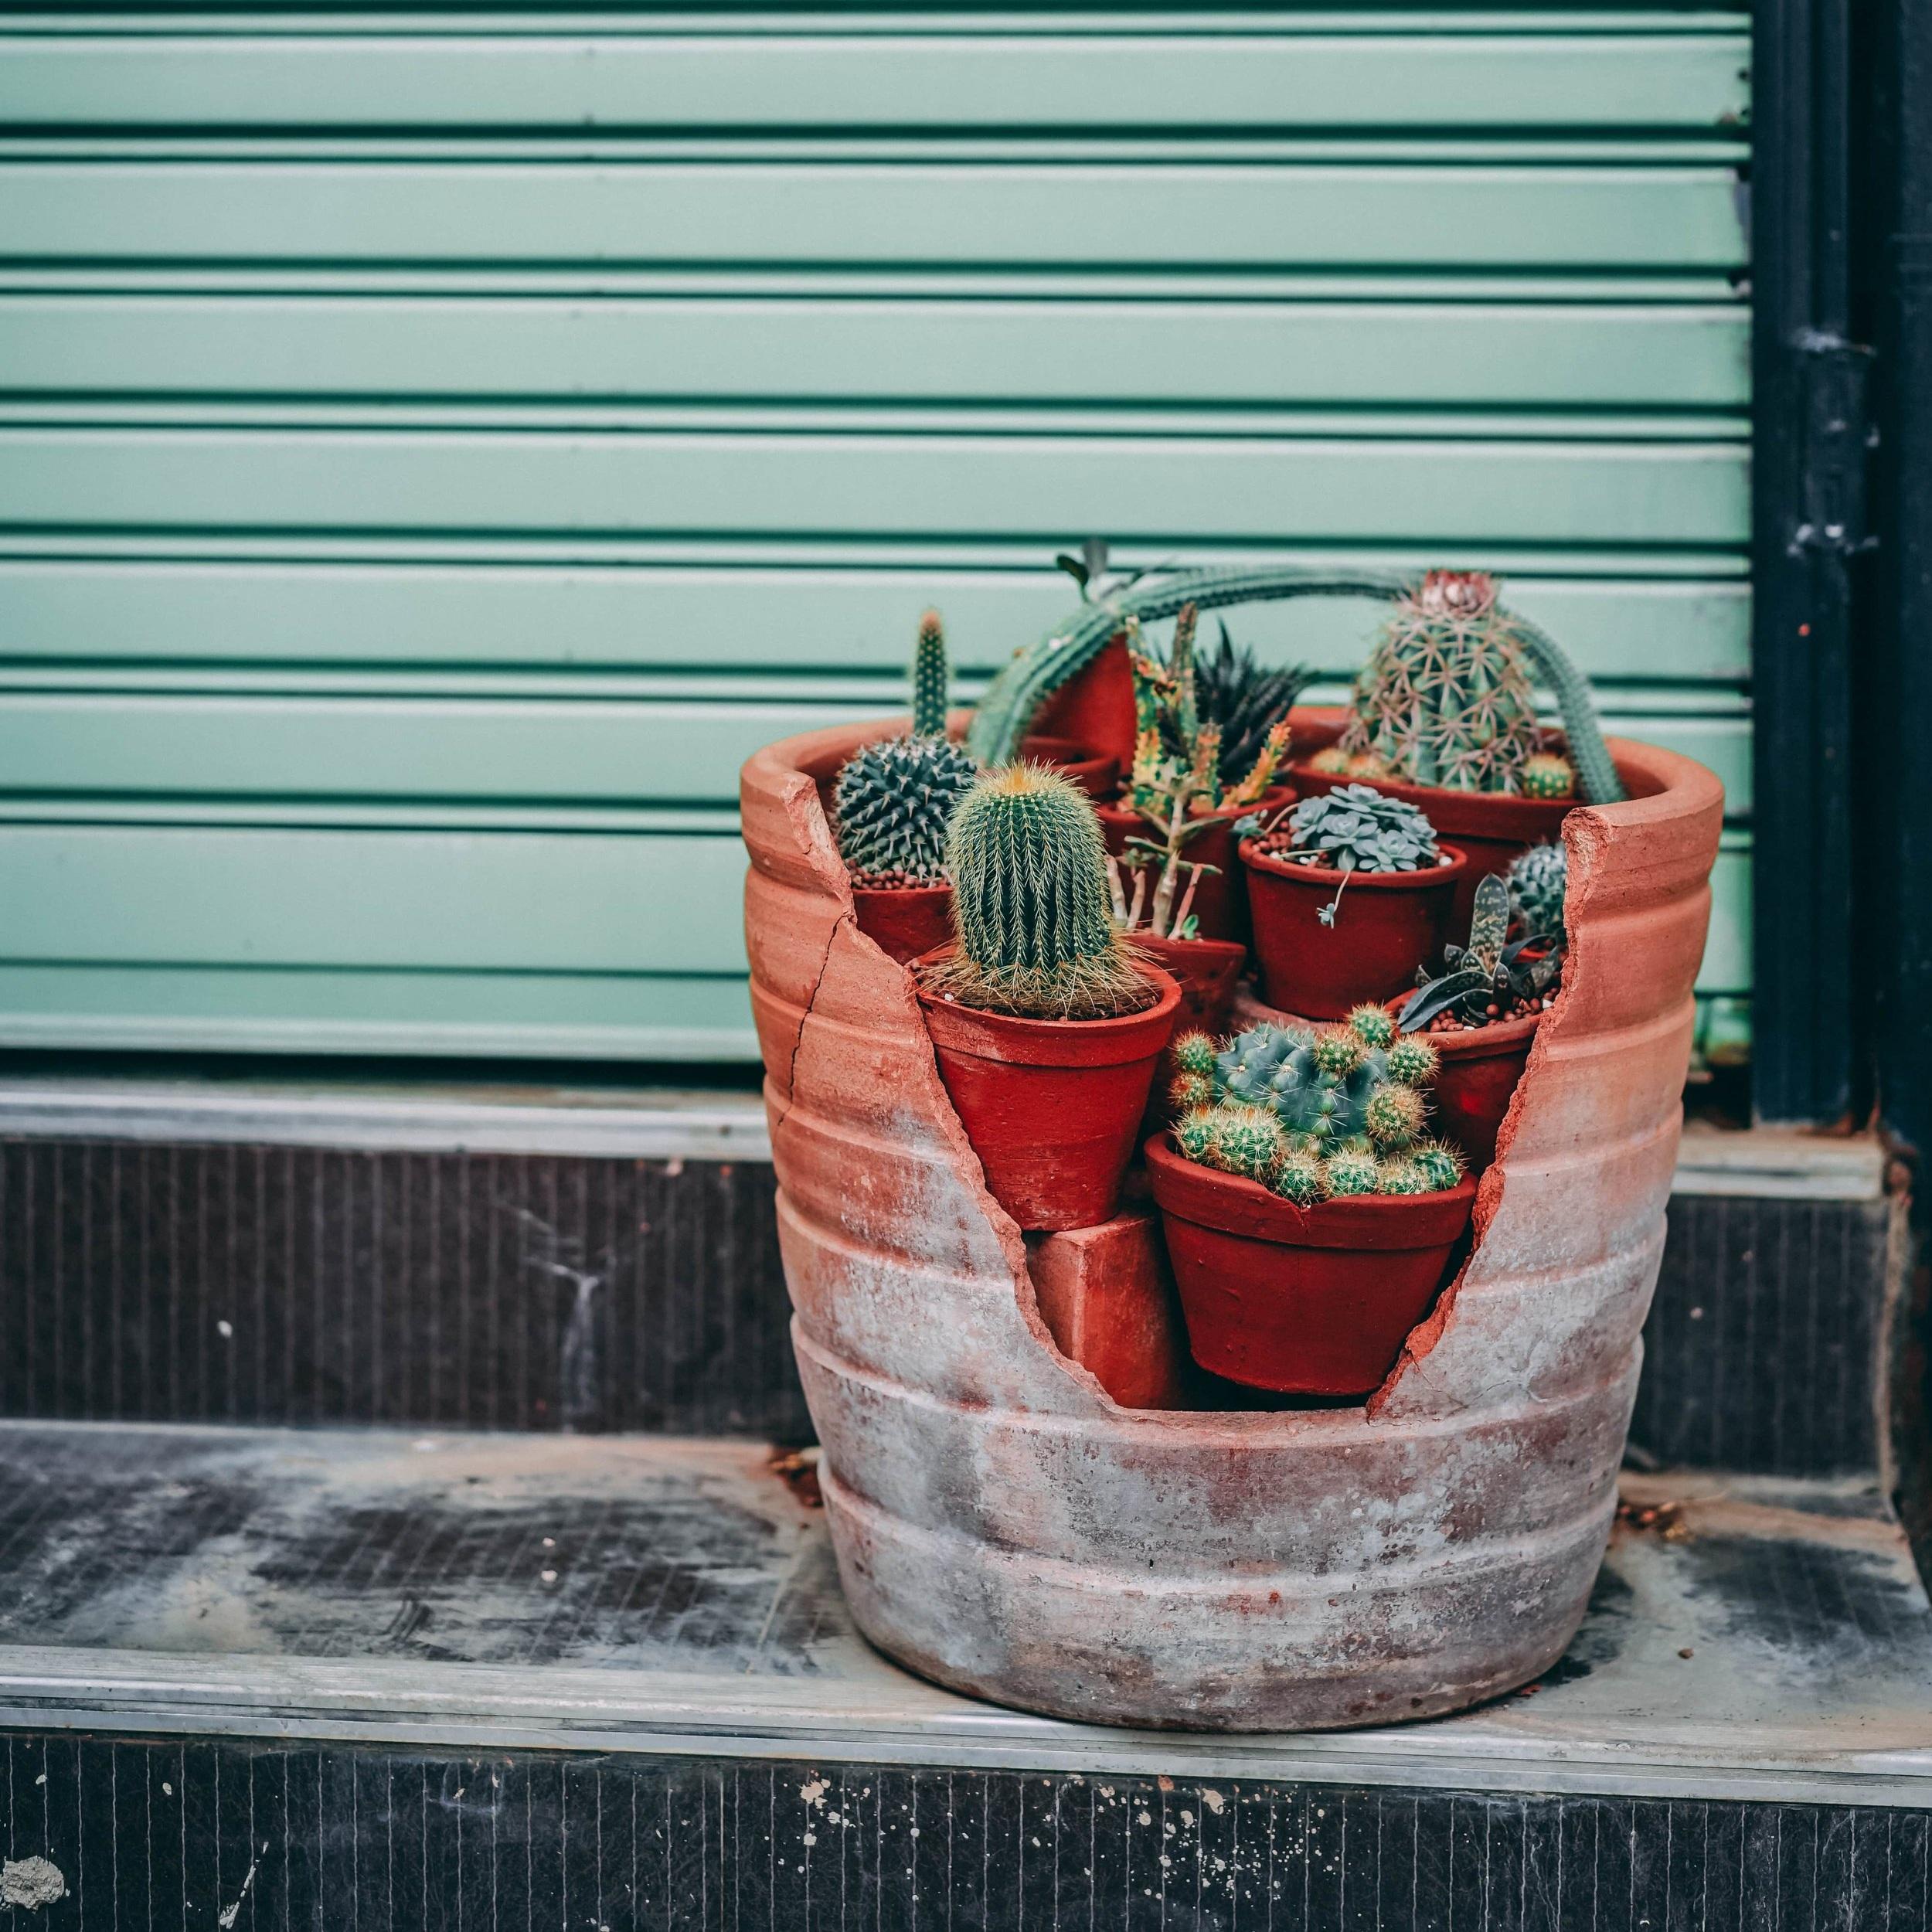 Terra cotta pot with cacti.